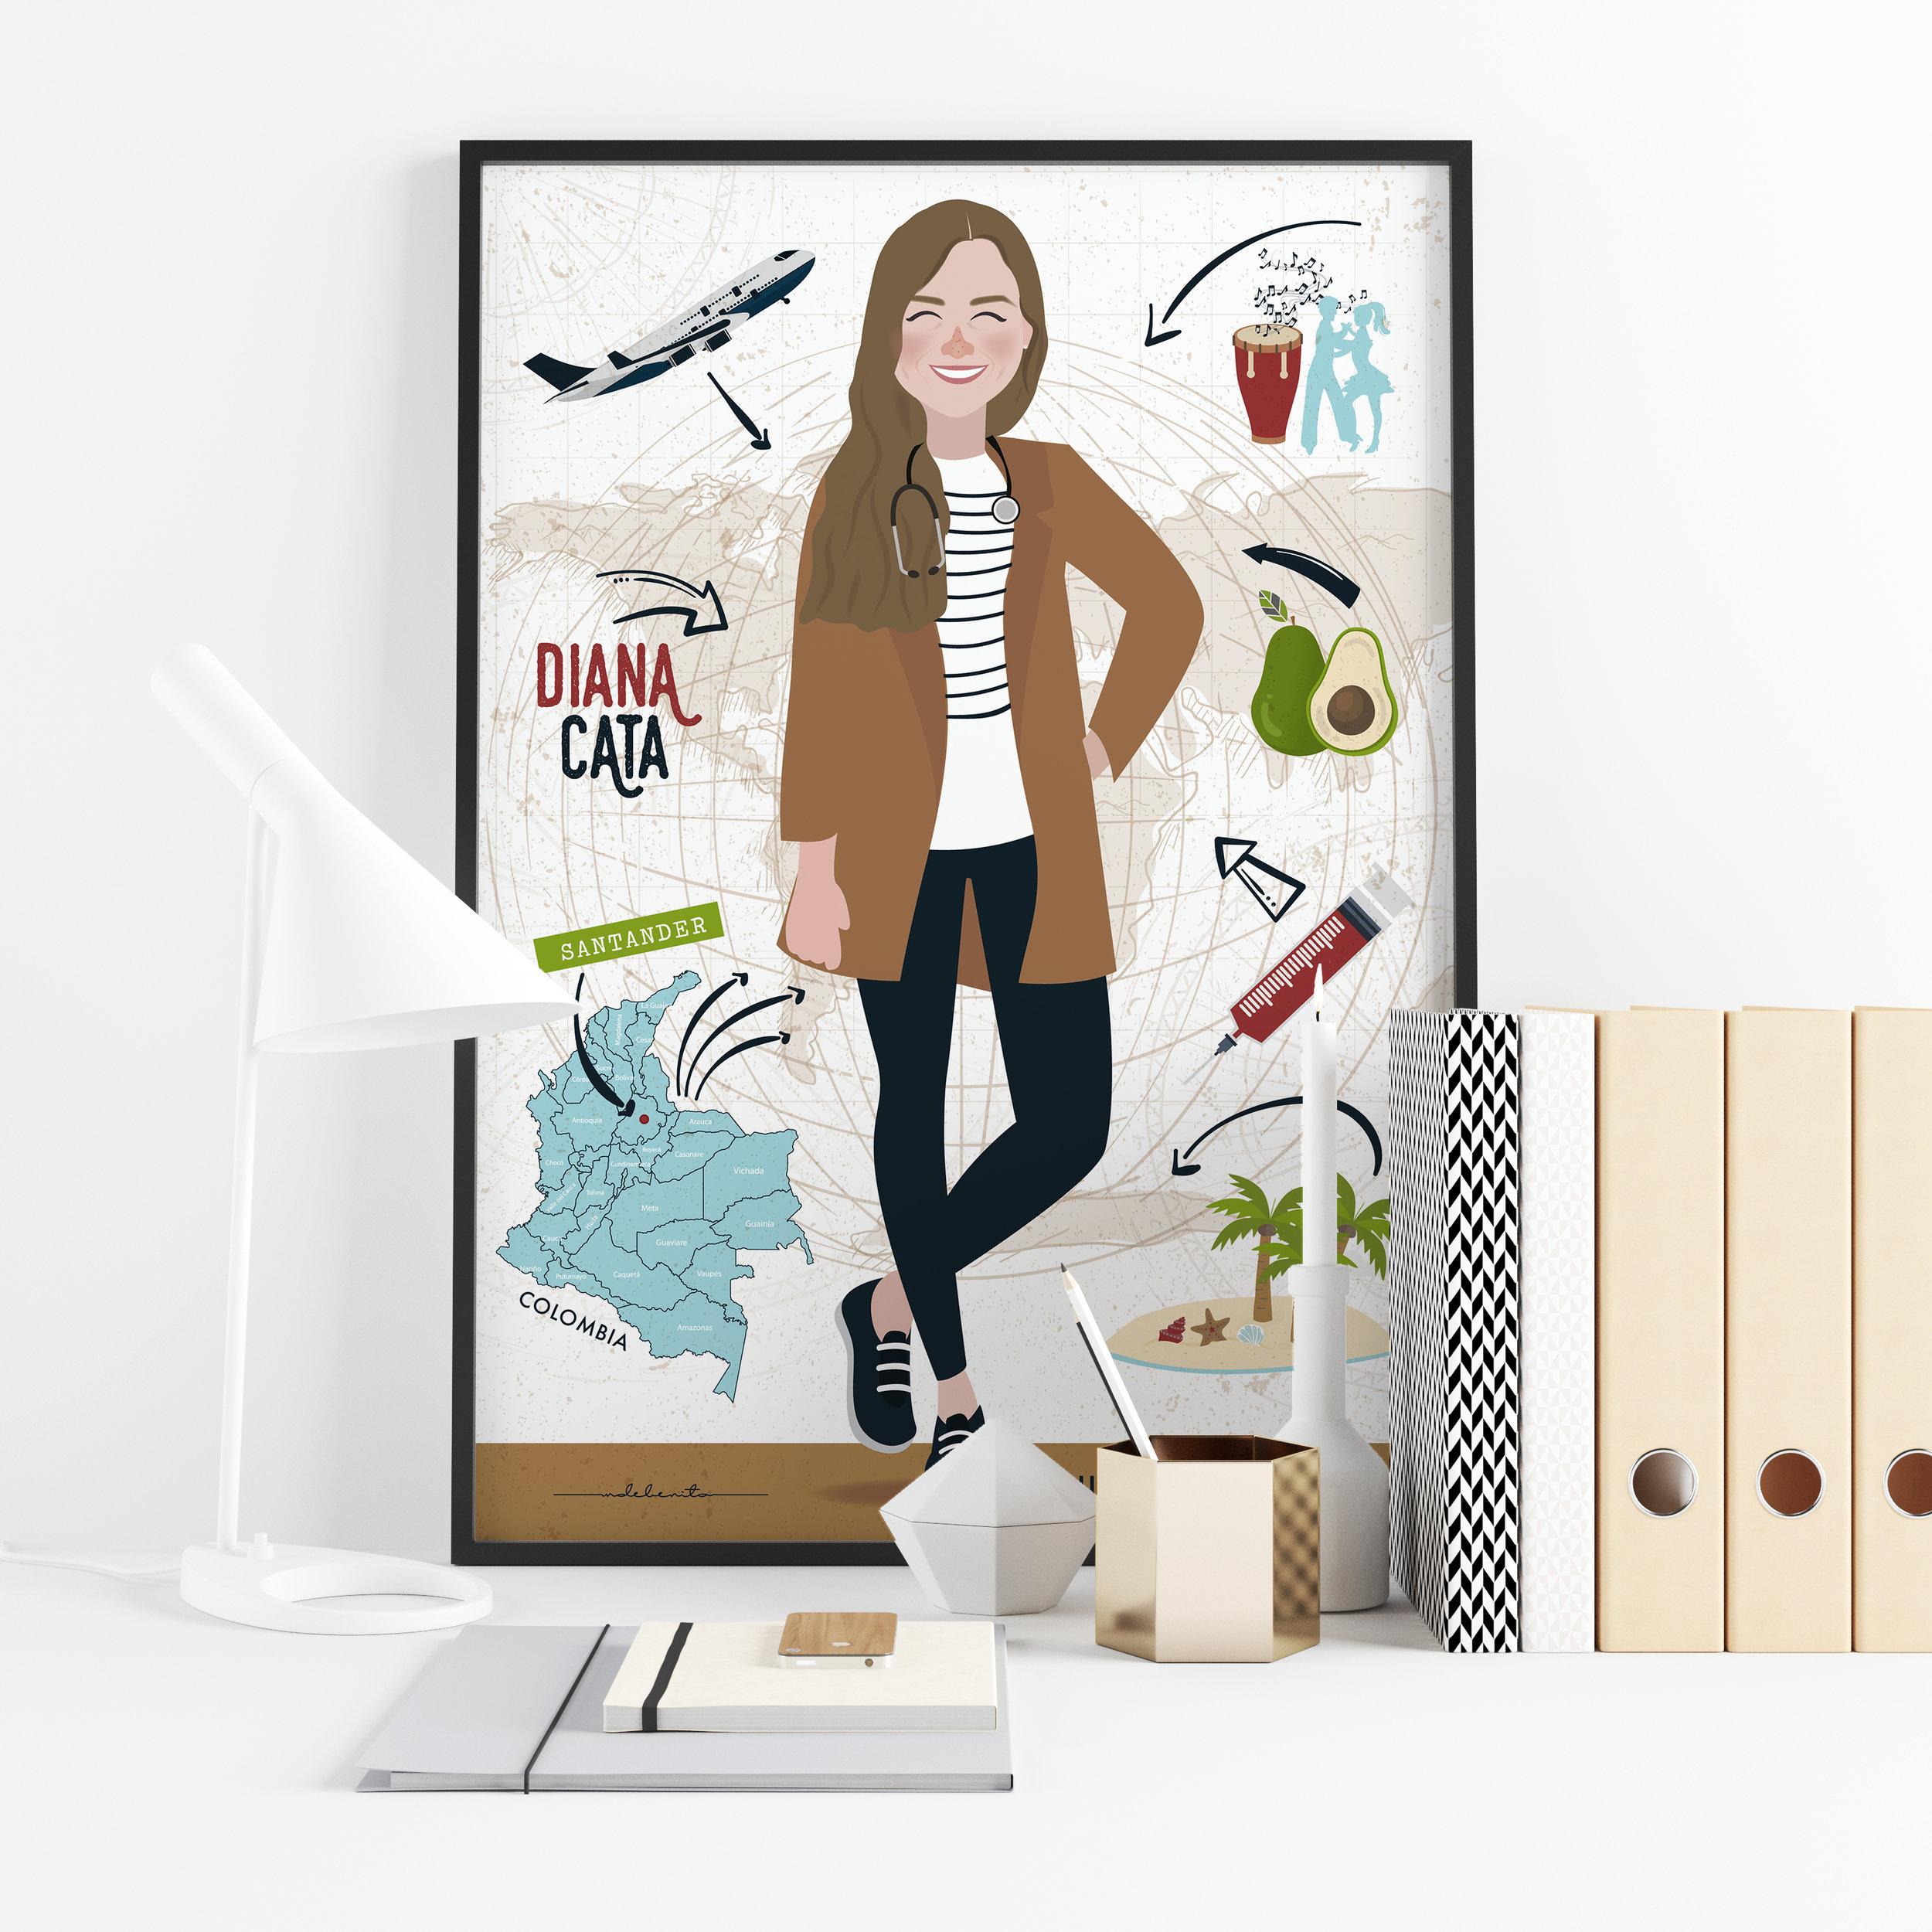 ilustracion-chica-mdebenito-diseño-personalizado-.jpg